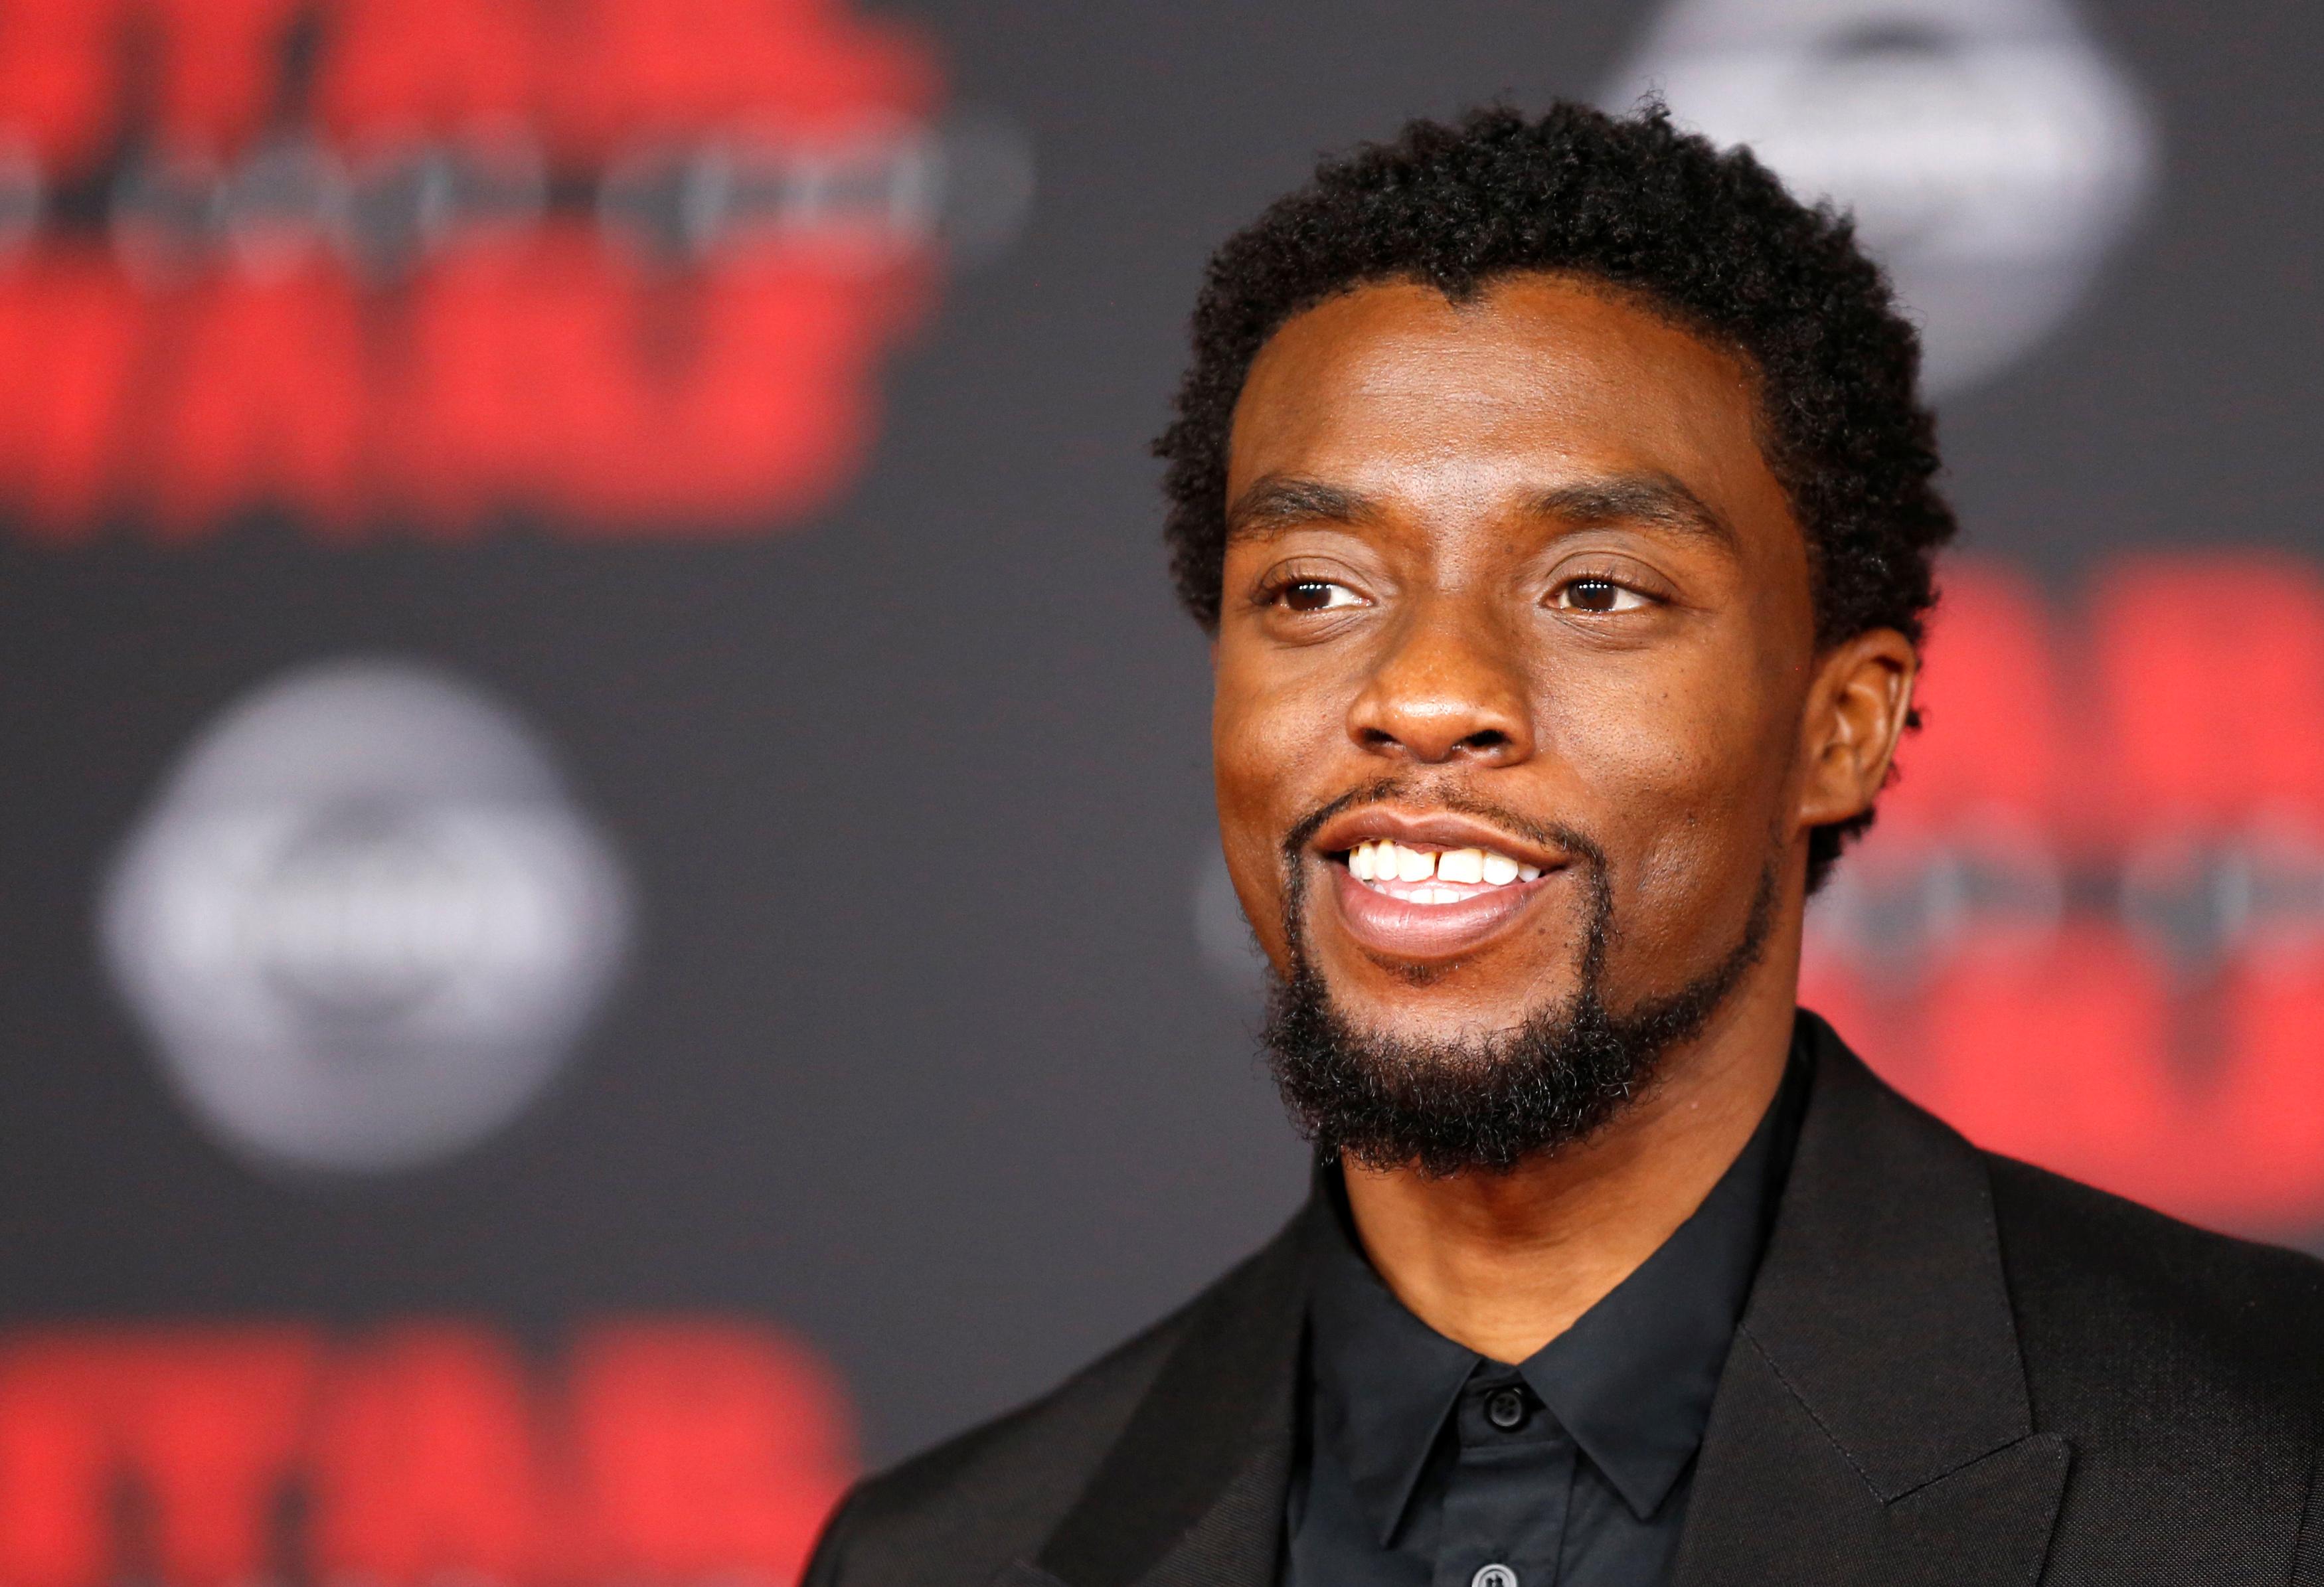 Chadwick Boseman: artistas lamentam morte do ator de 'Pantera Negra' | CNN Brasil